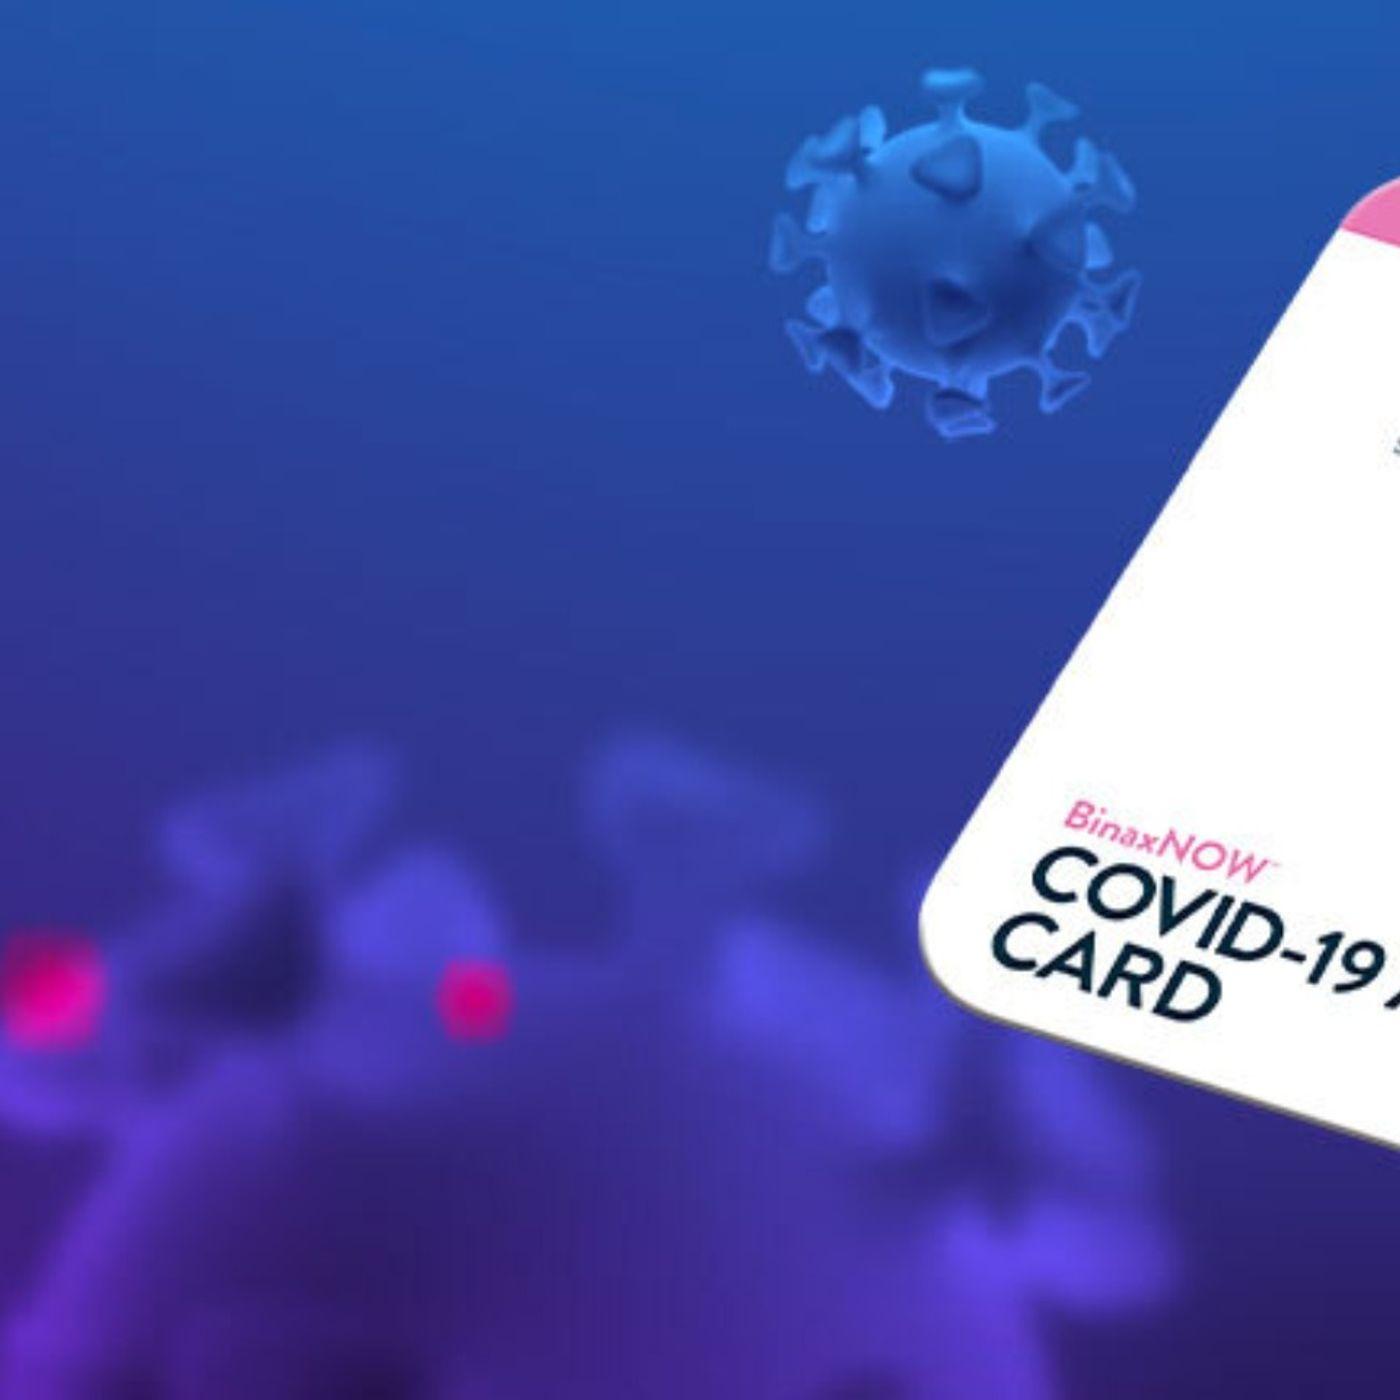 A Faster, Cheaper Test -- Will It Really Democratize Coronavirus Testing?